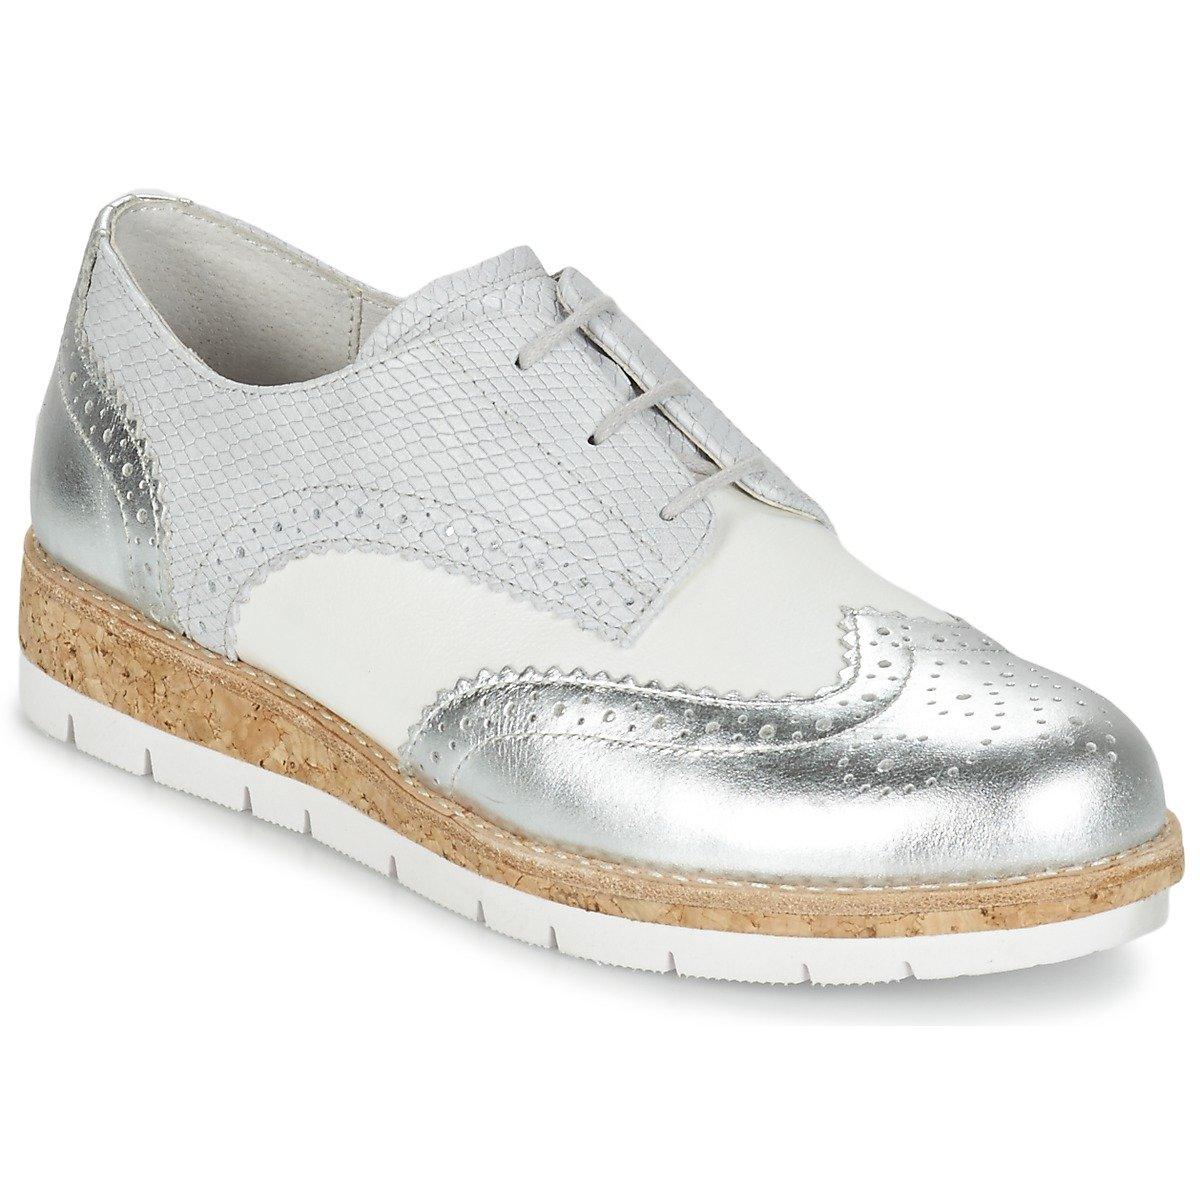 Gabor 62.558.90 - Zapatos de cordones para mujer 39 EU|Off-Withe